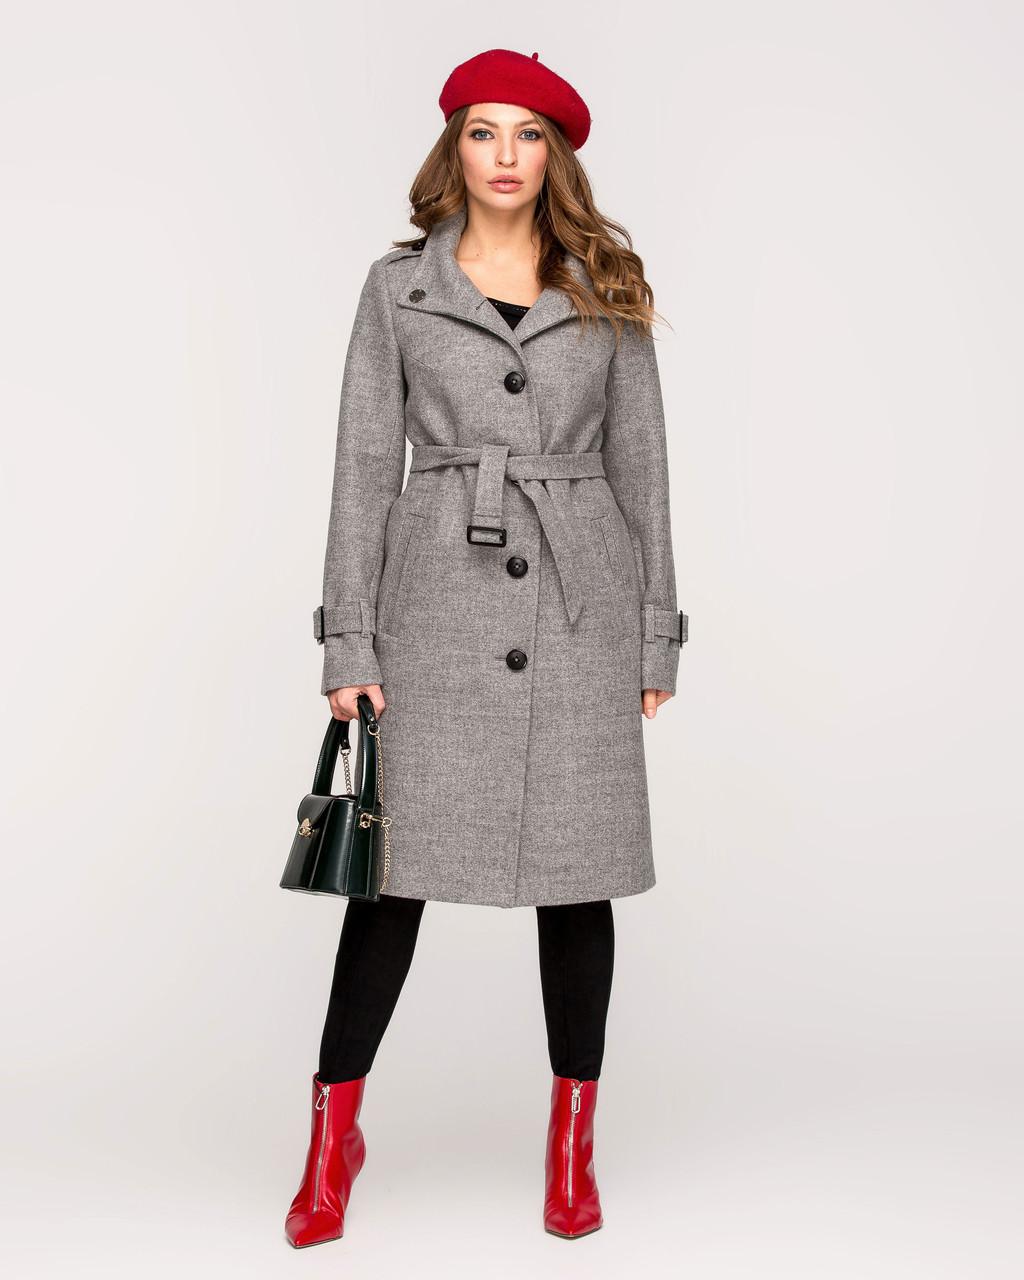 Пальто жіноче з 42 по 52 р. Весна 2020